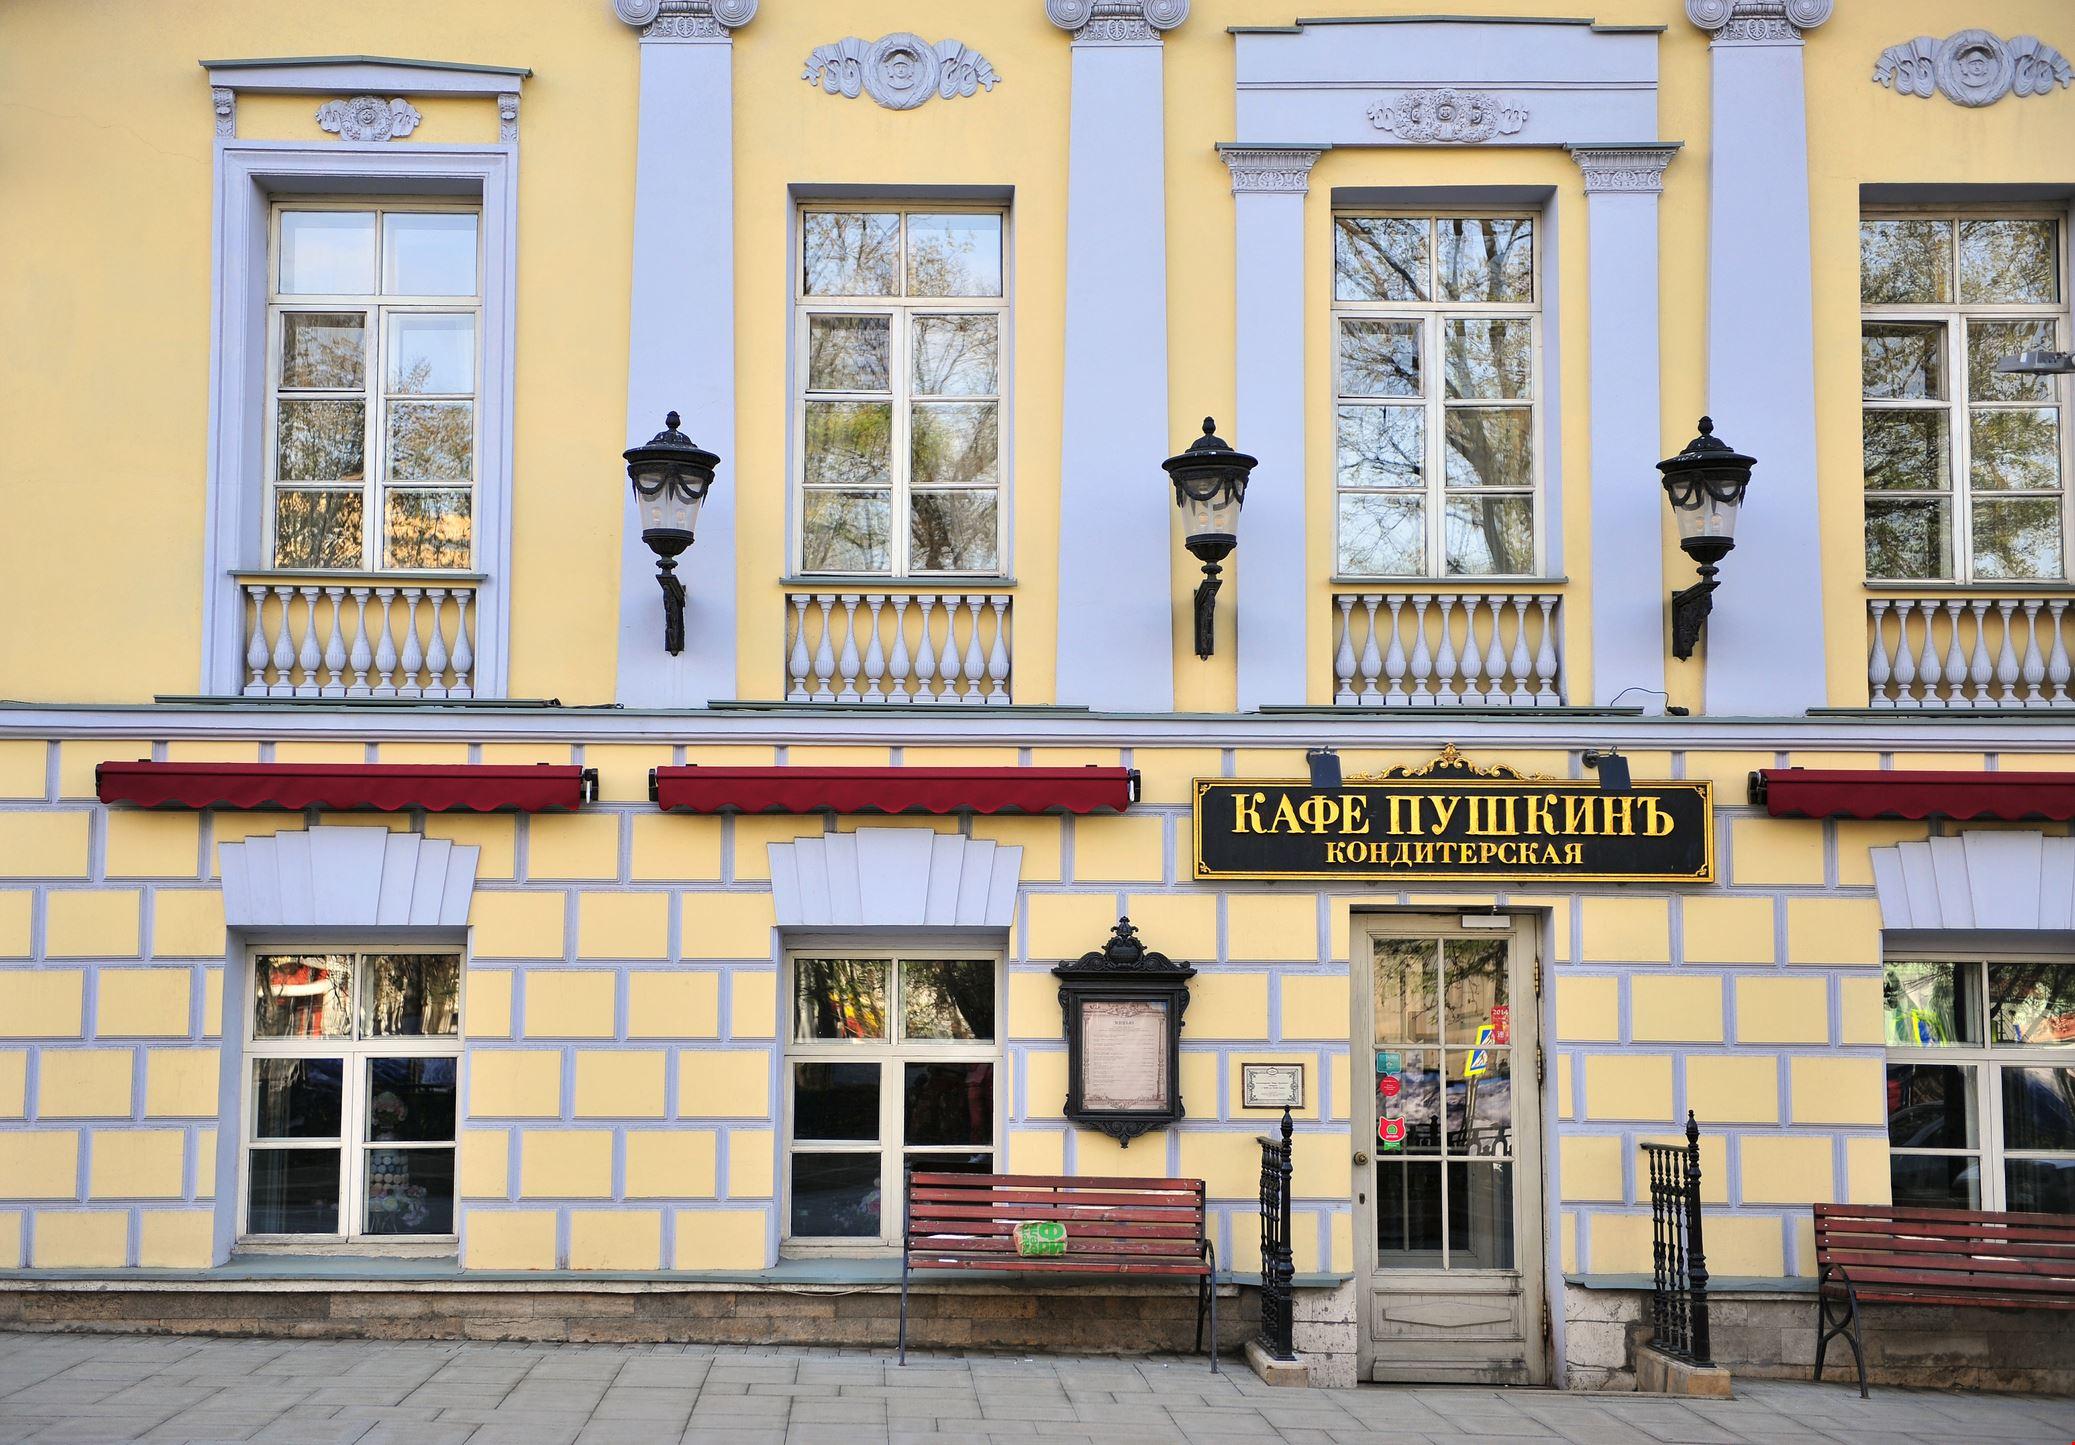 Caffè Pushkin